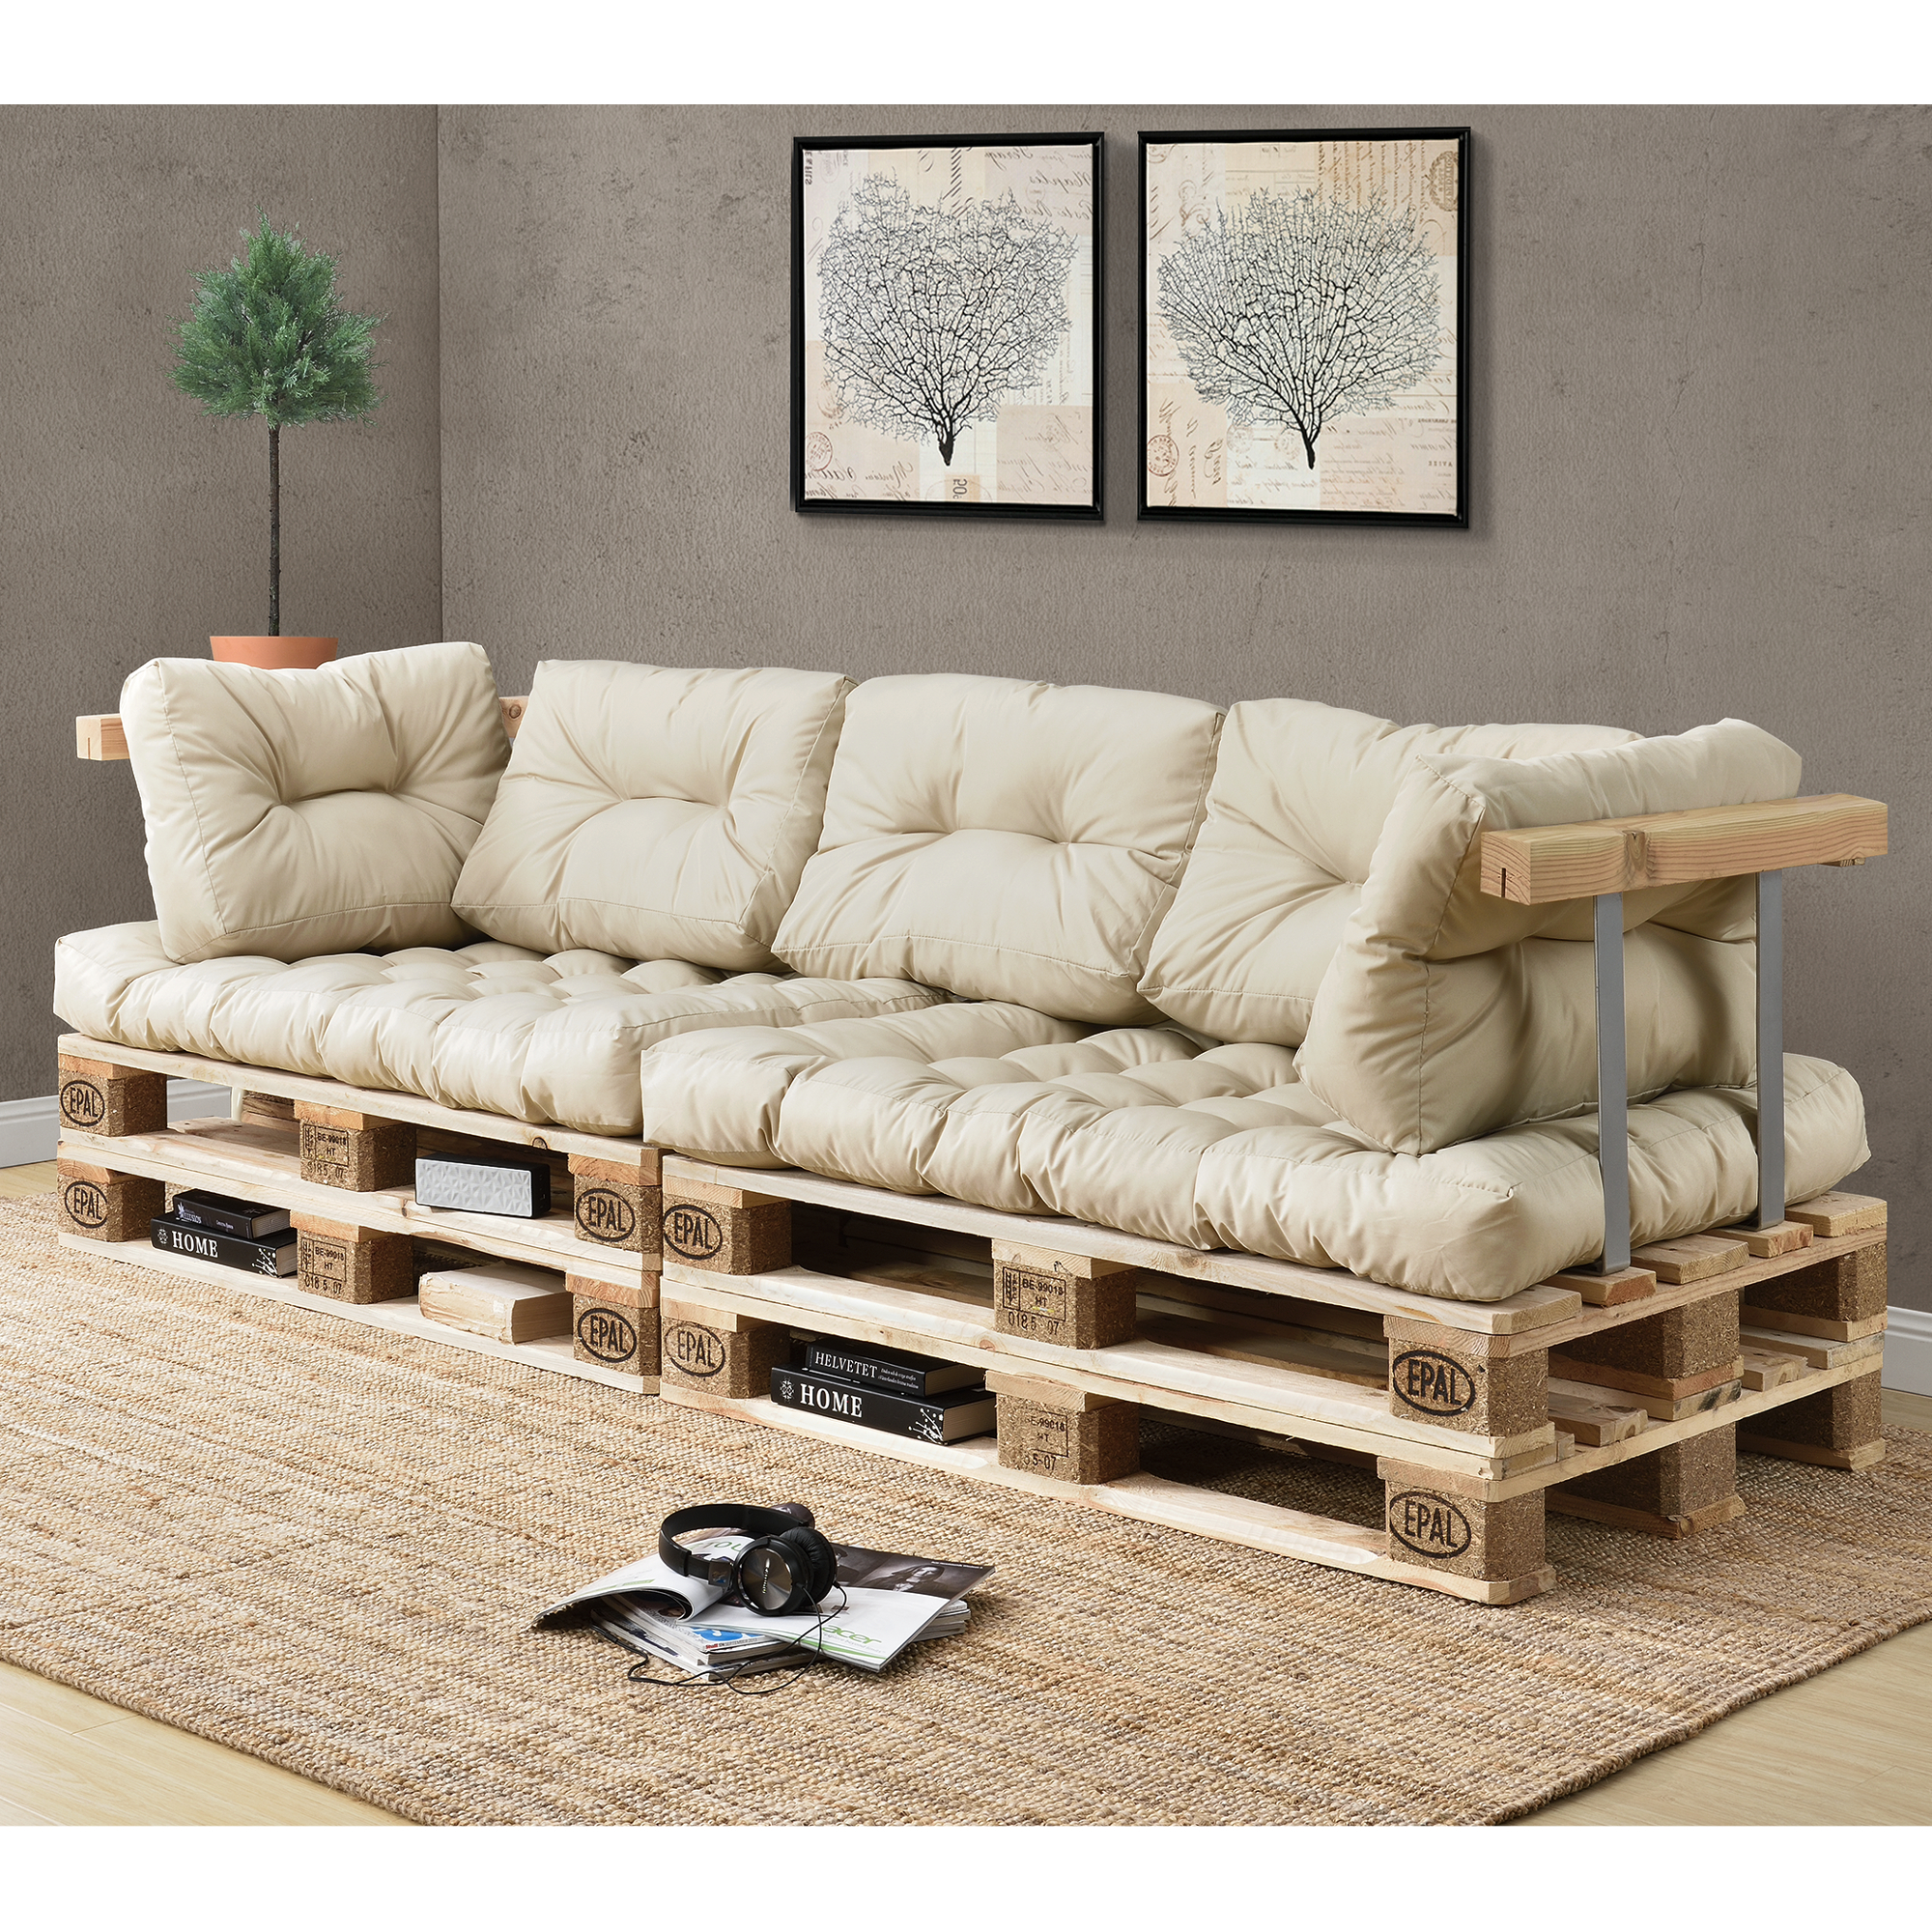 1x sitzpolster palettenkissen in outdoor for Paletten sofa outdoor